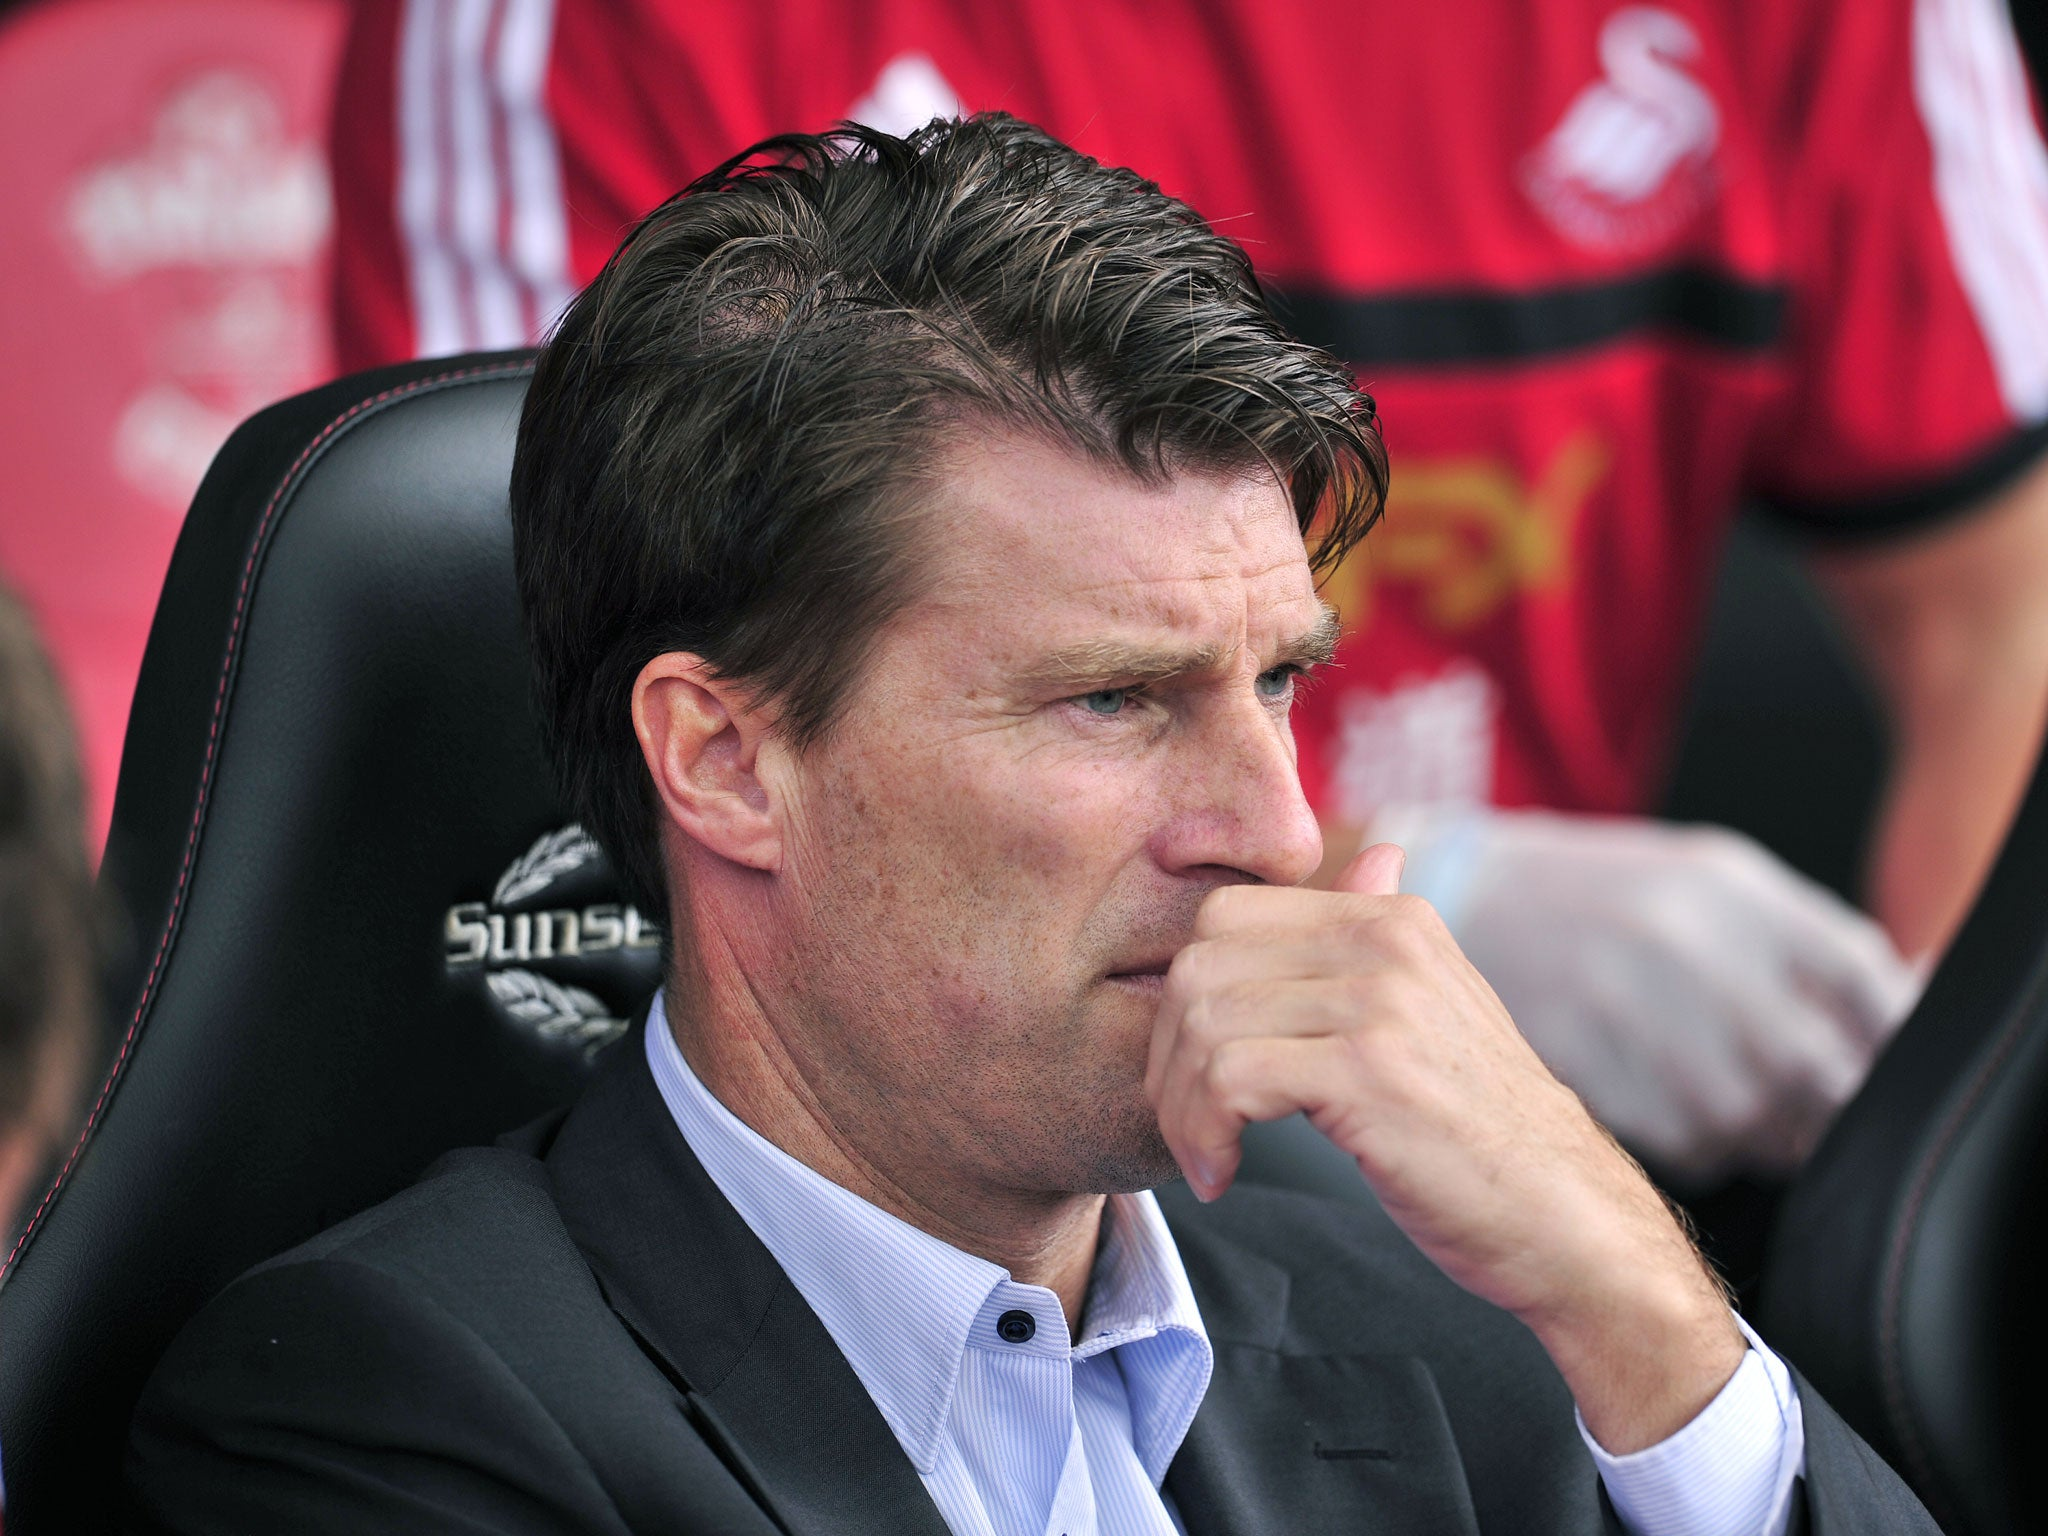 Sir Alex Ferguson autobiography Michael Laudrup believes Fergie